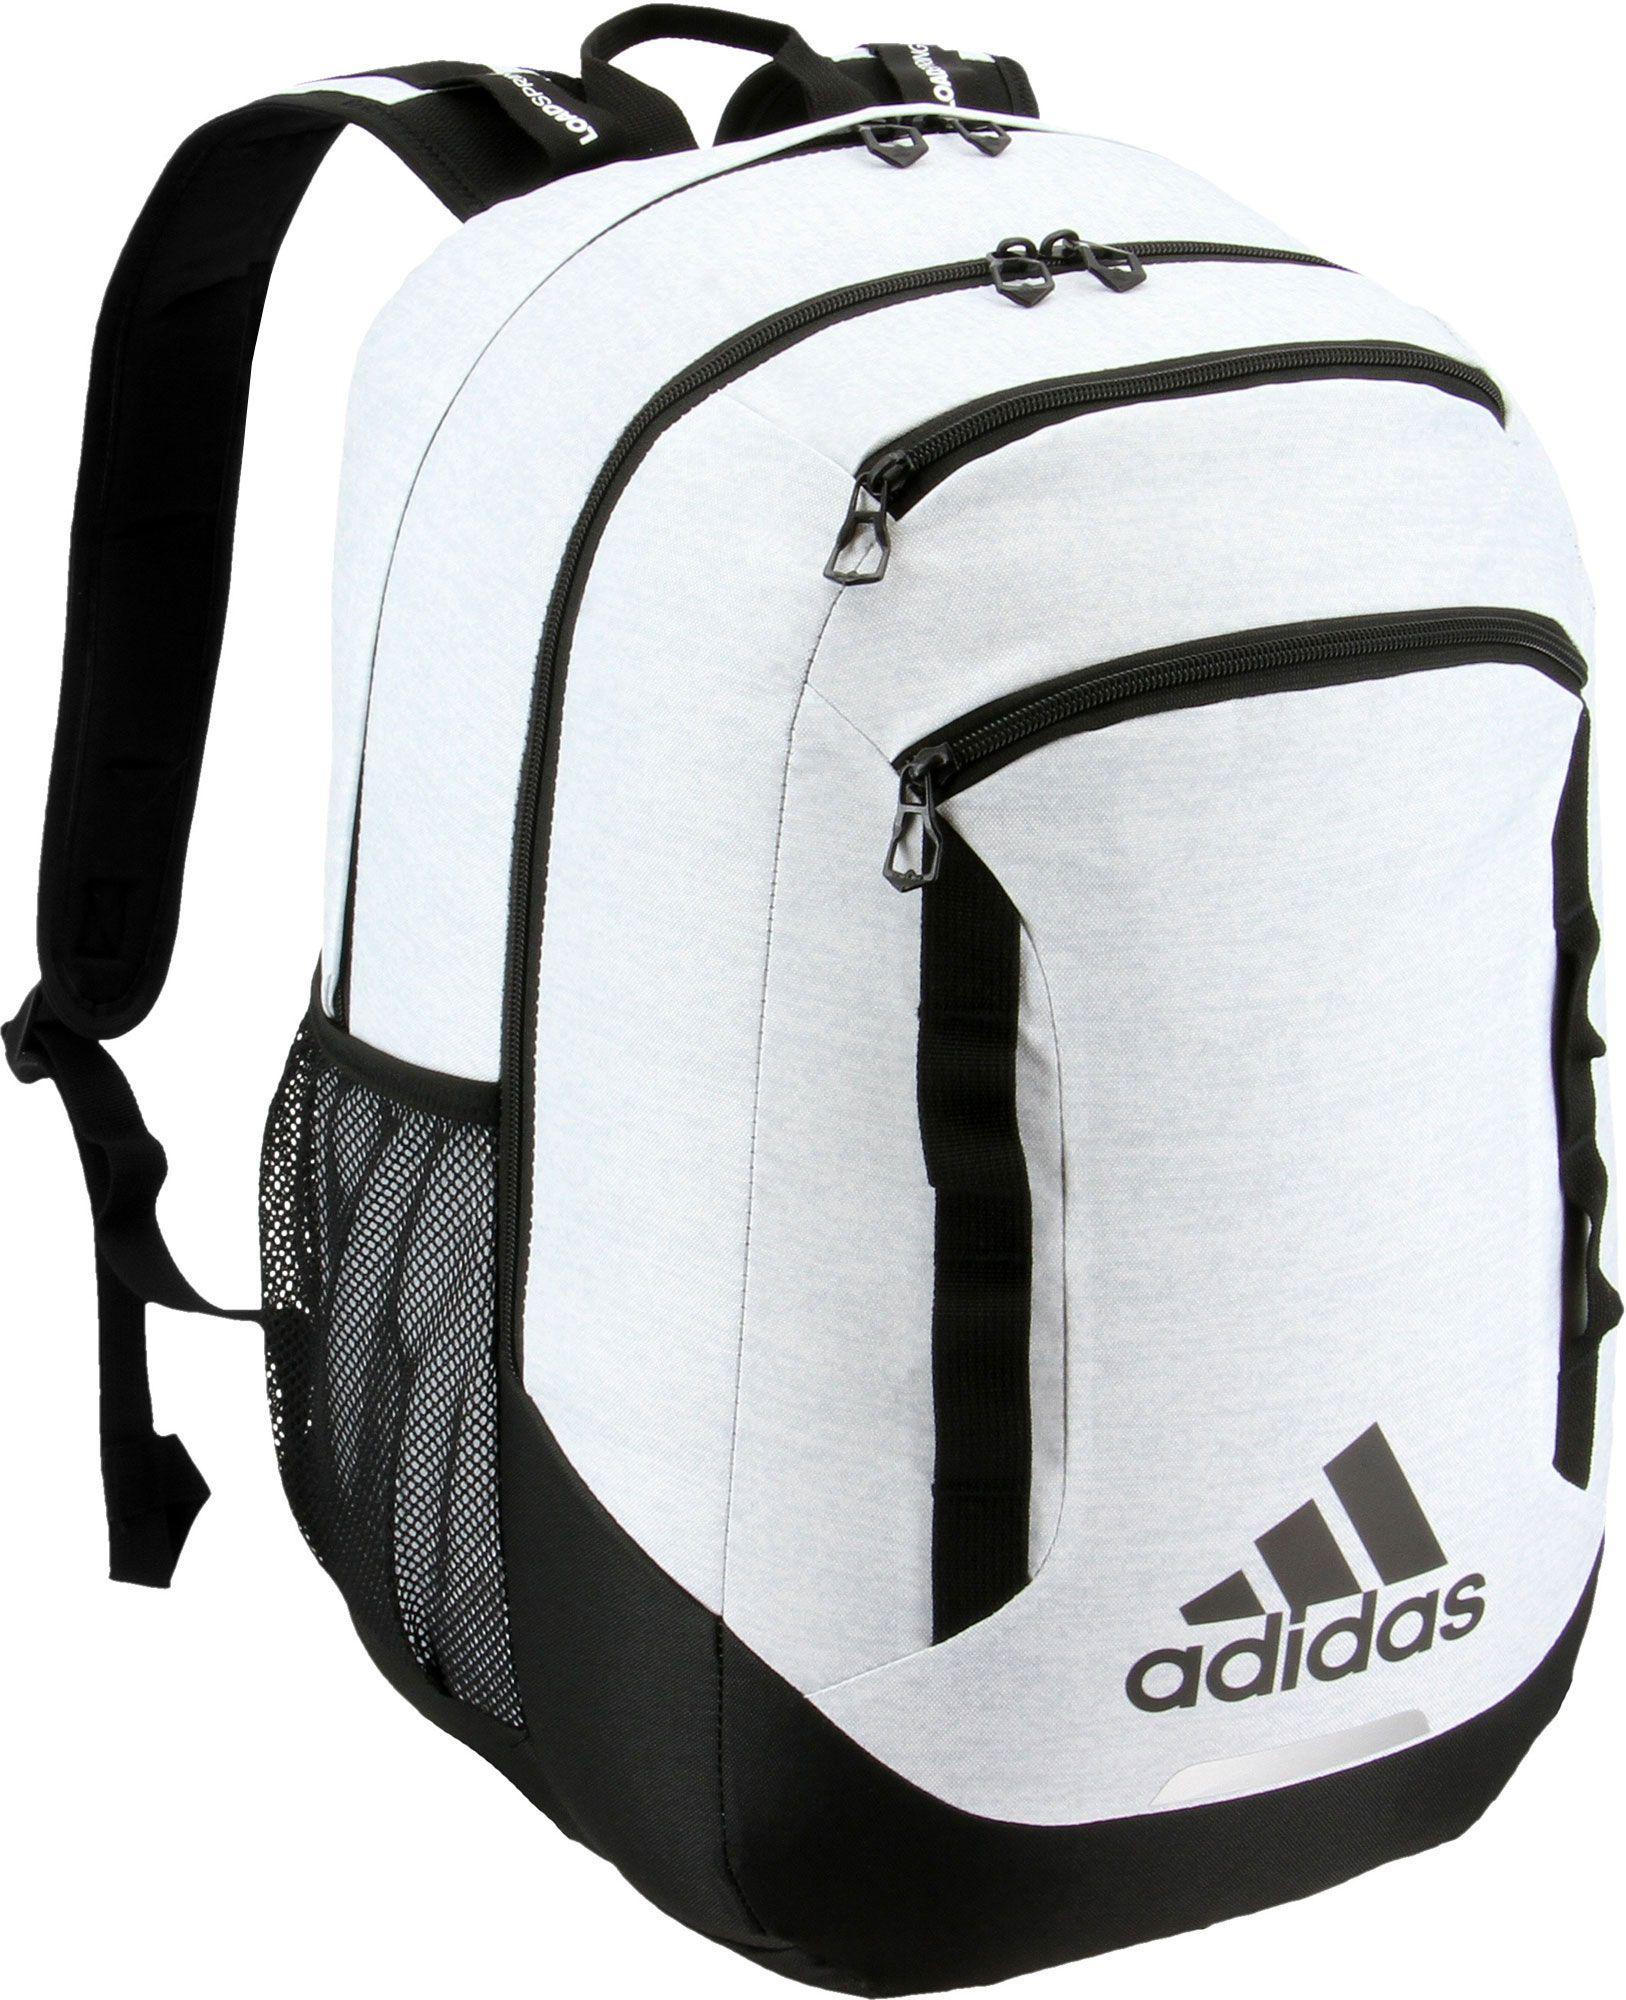 b5ec5b6e17f3 adidas Rival XL Backpack